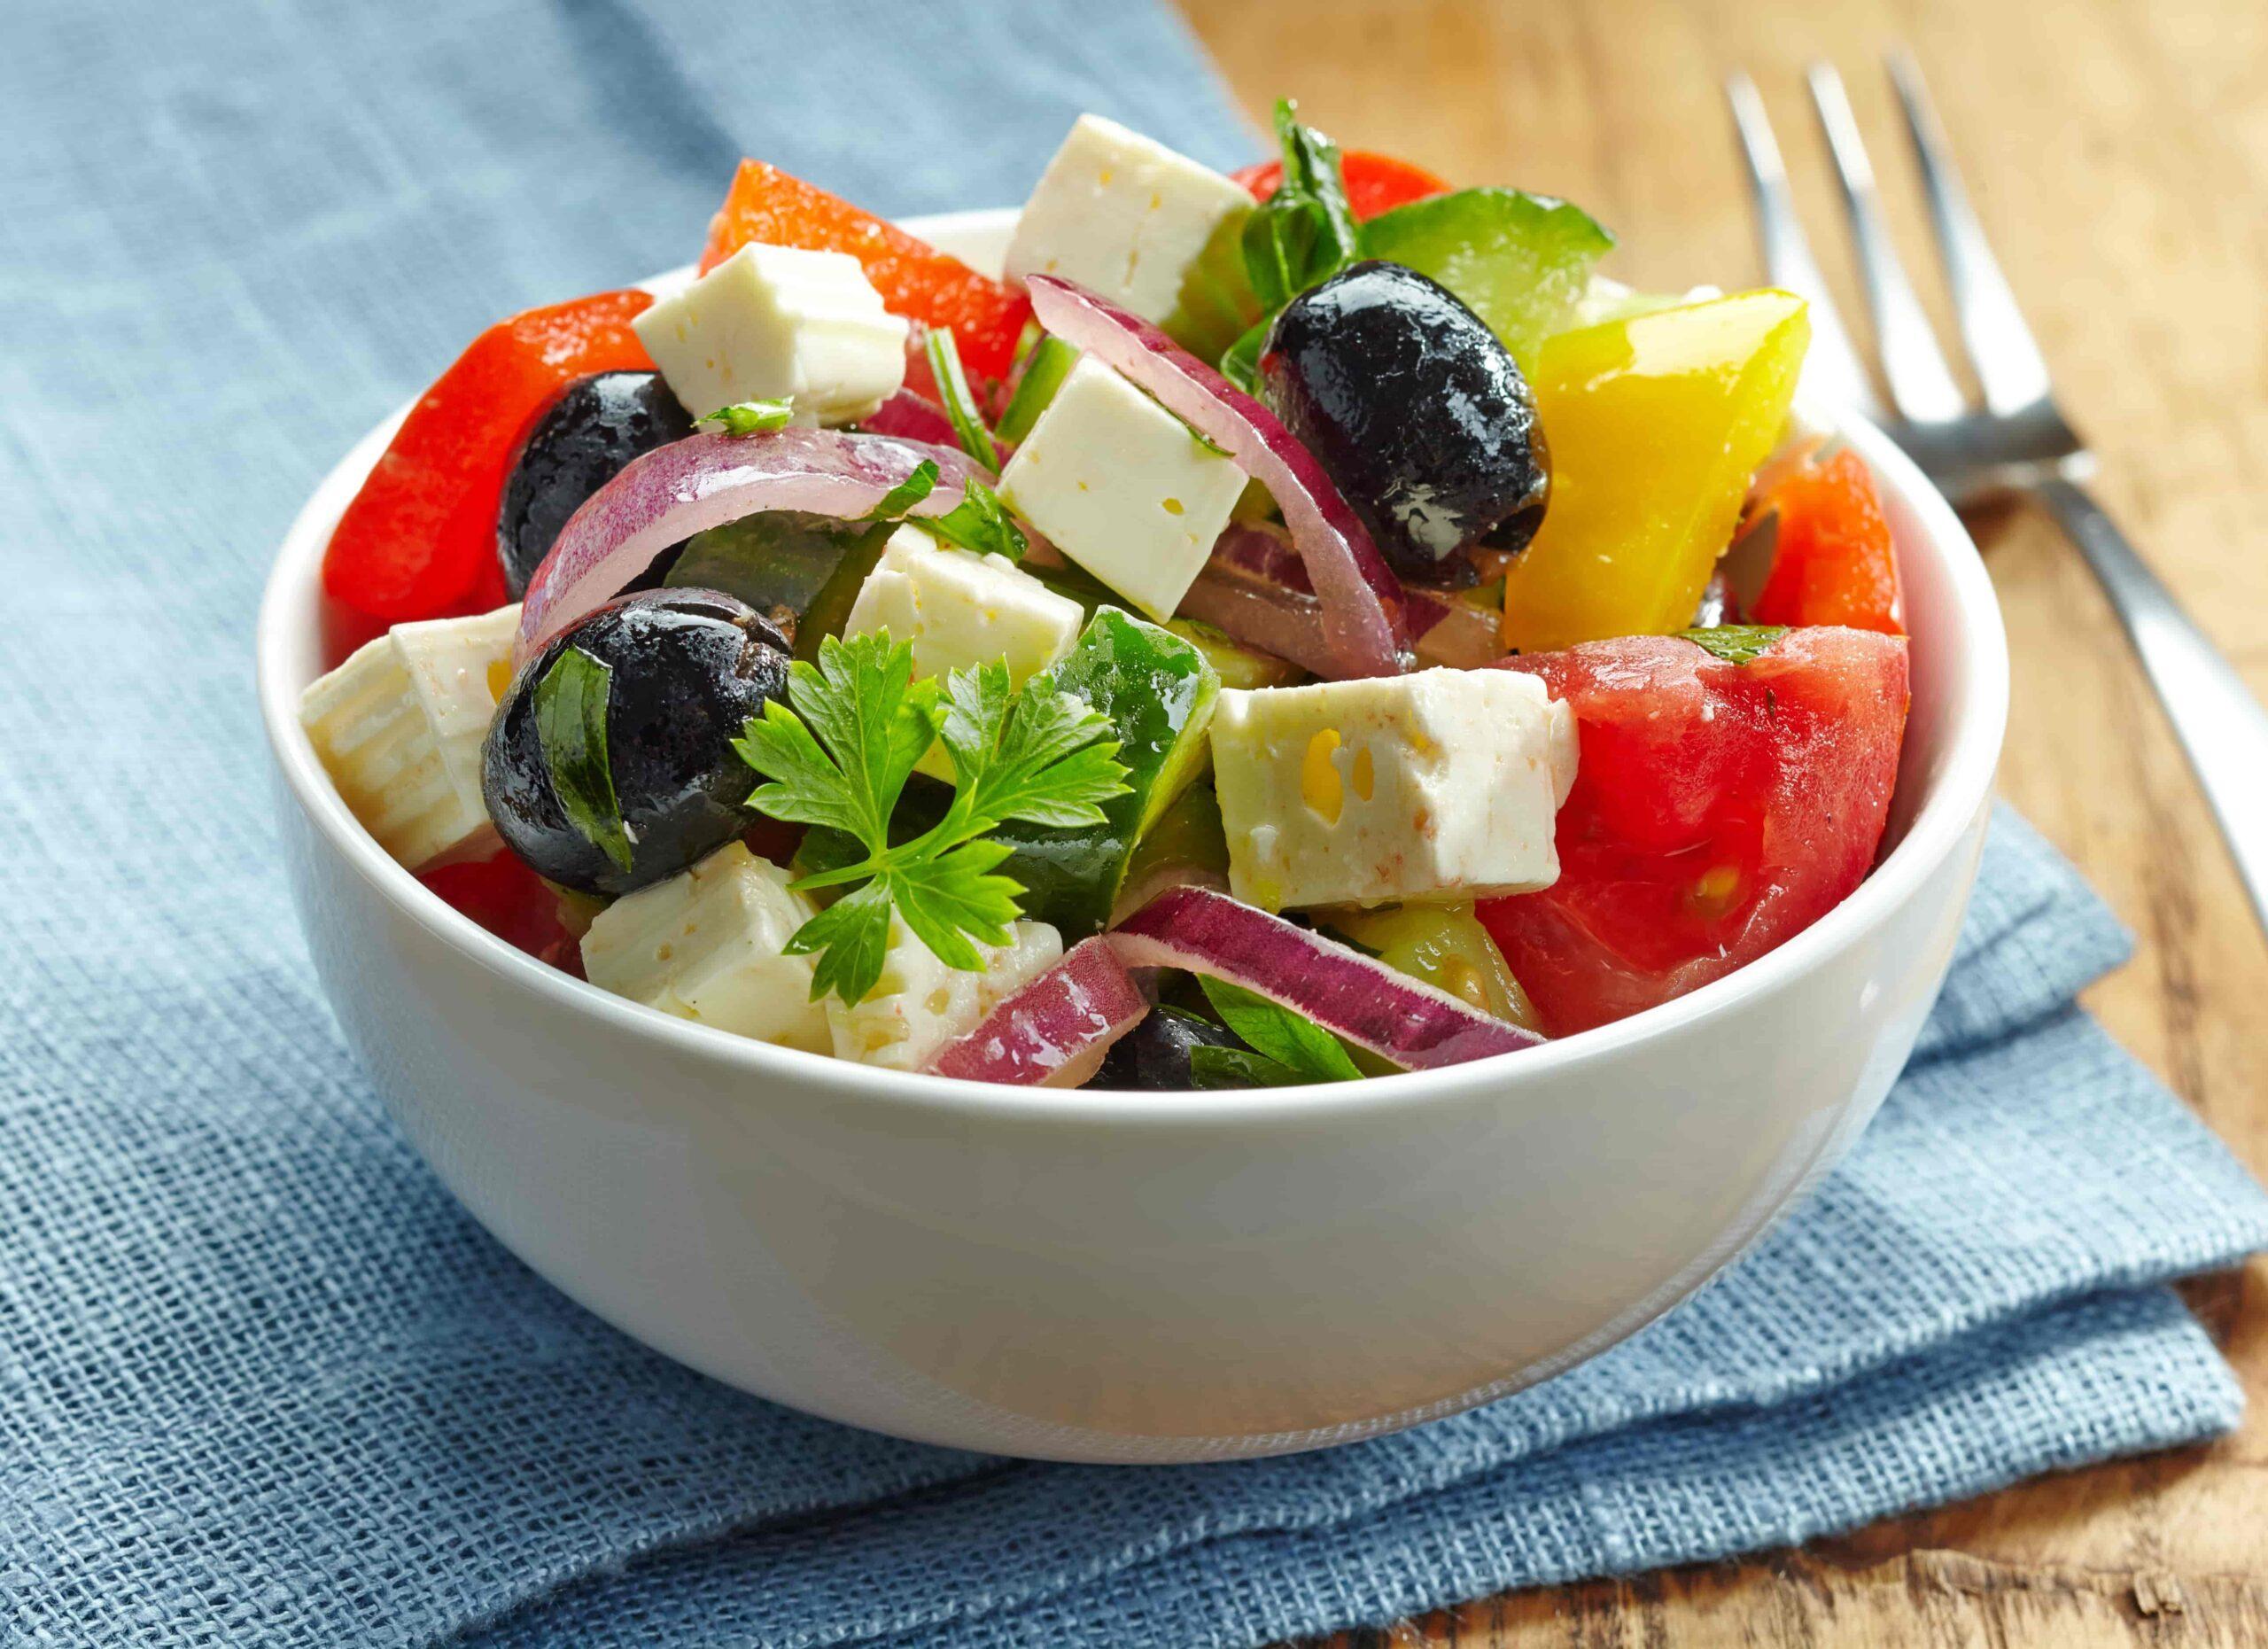 homemade-greek-salad-pkpew4g-min-2522903